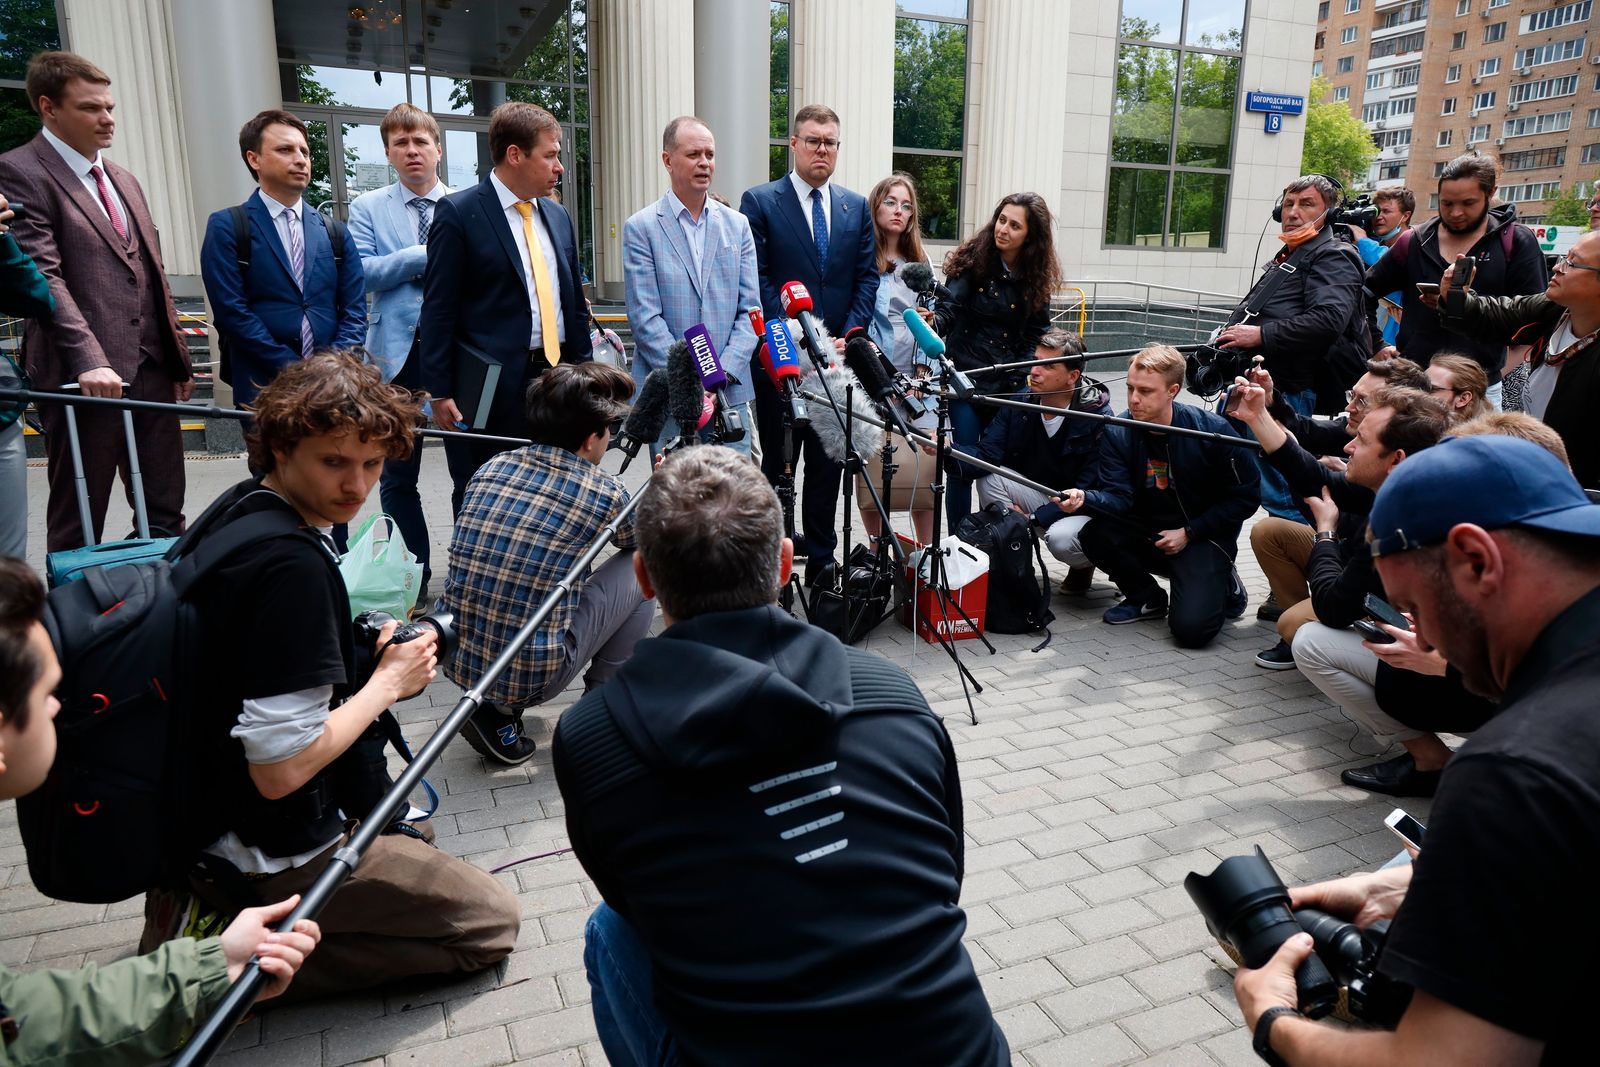 Russischer Anwalt Pawlow